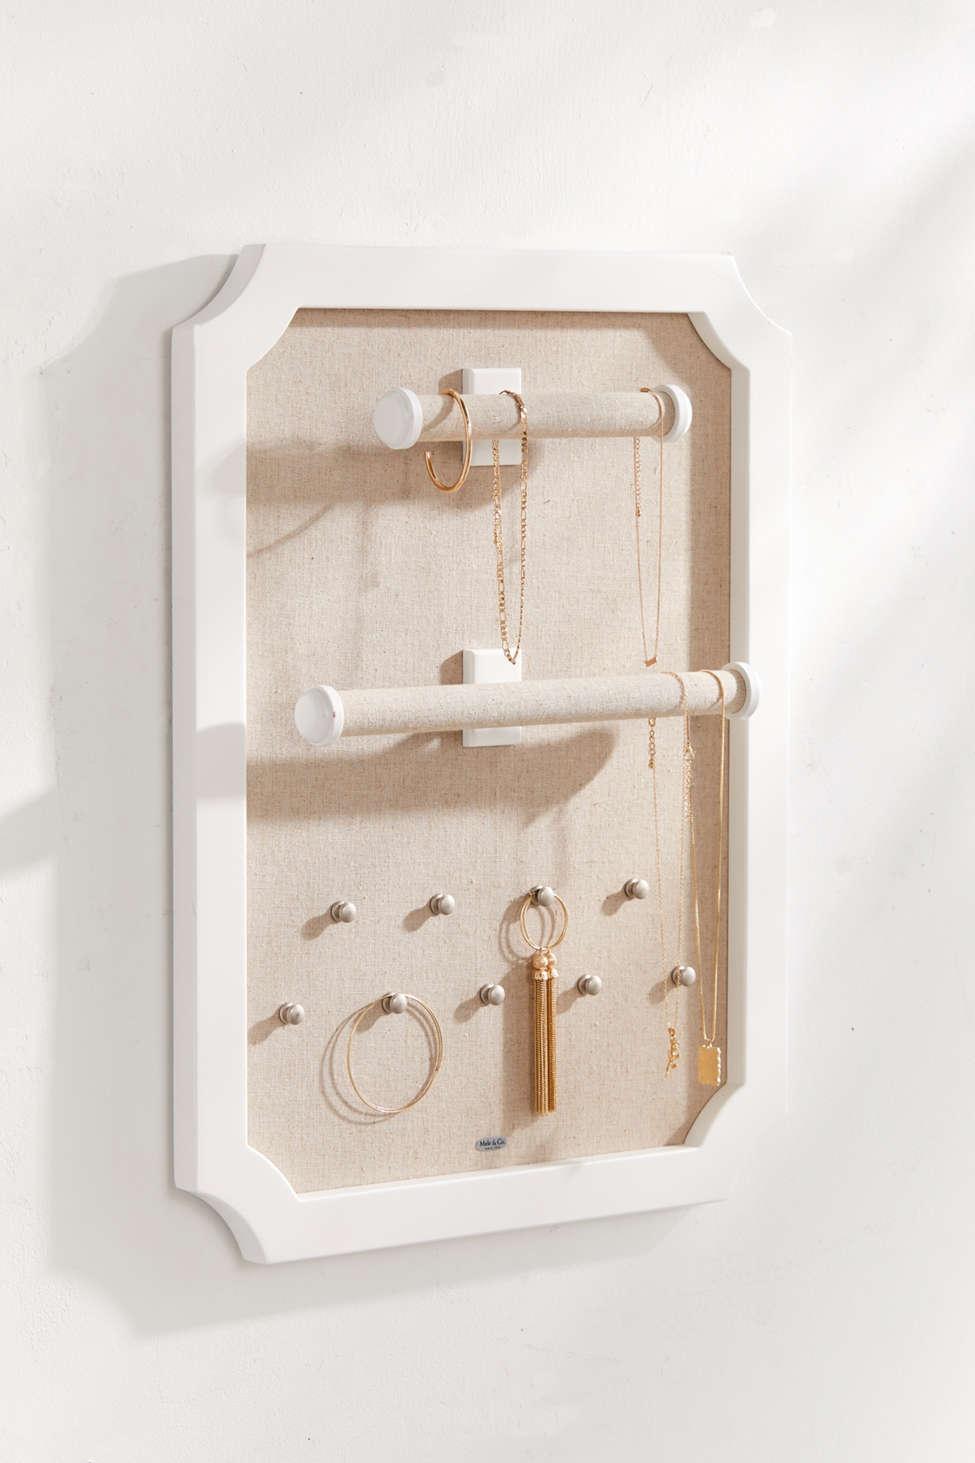 Slide View: 1: Mele & Co. Kyla Hanging Jewelry Storage